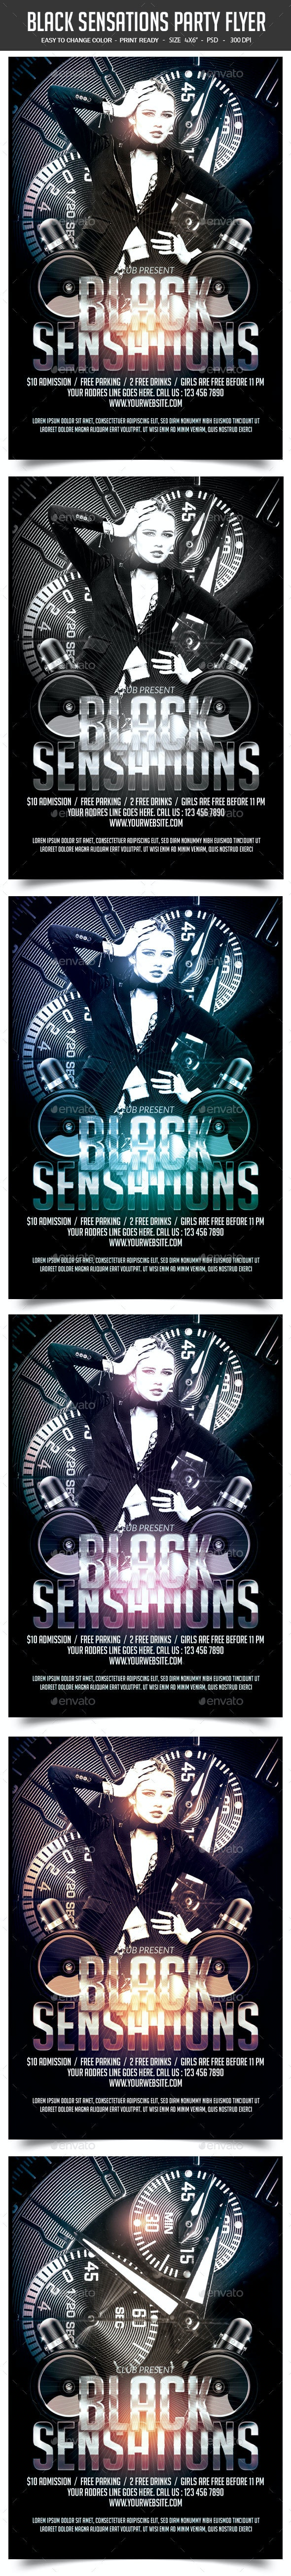 Black Sensations Party Flyer - Clubs & Parties Events